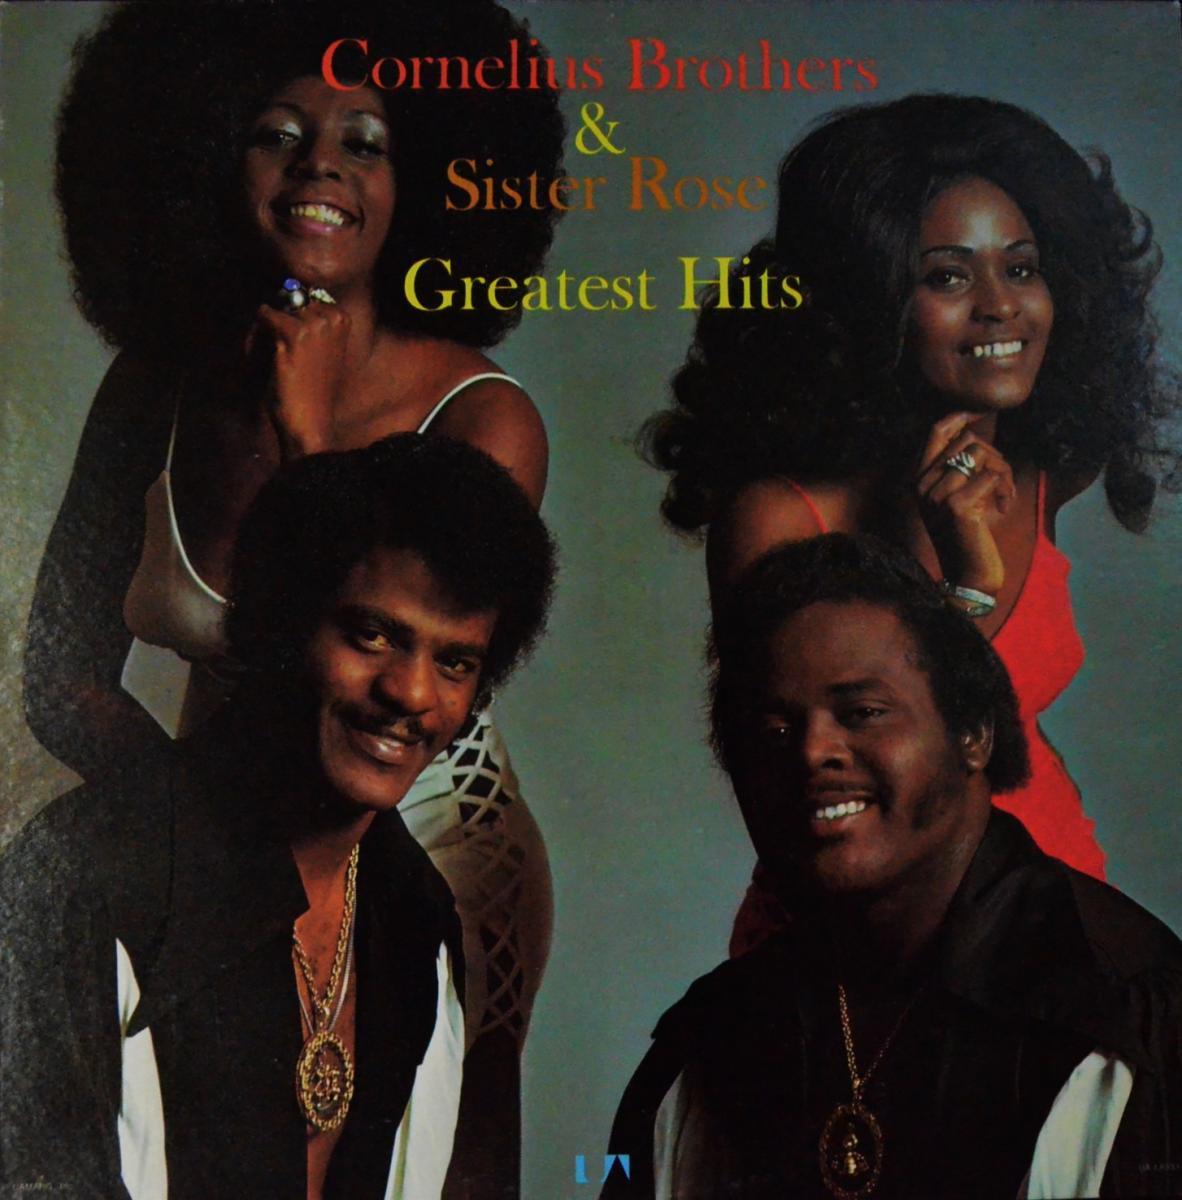 CORNELIUS BROTHERS & SISTER ROSE / GREATEST HITS (LP)